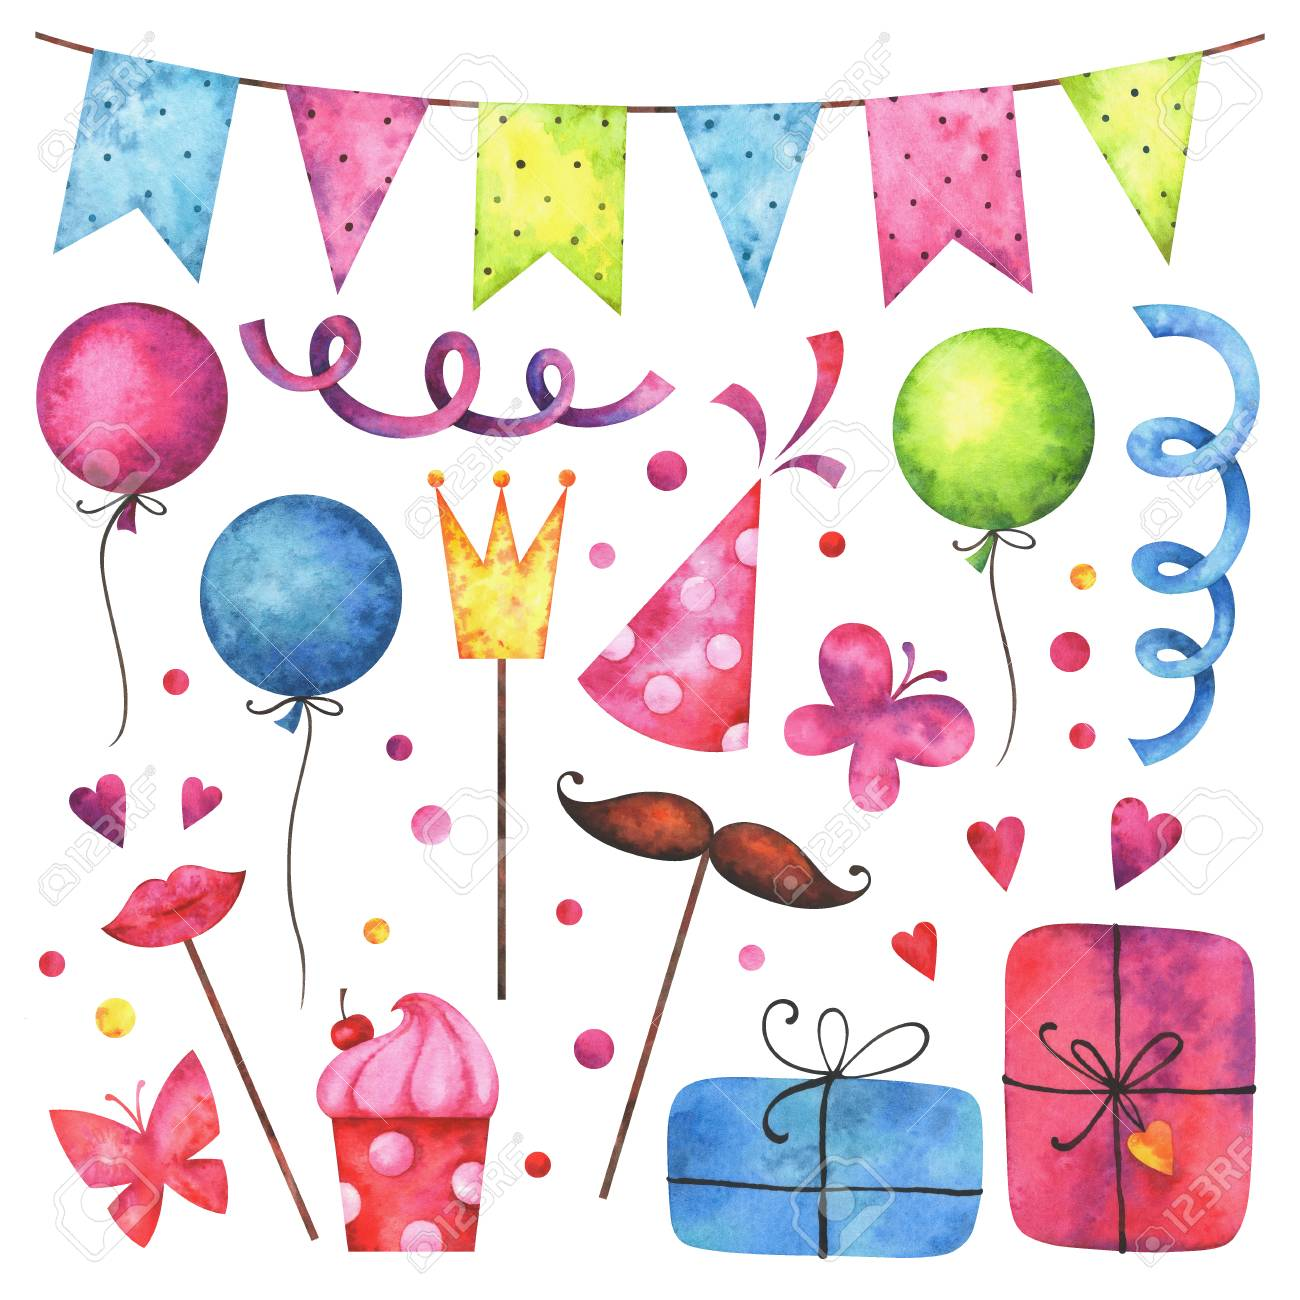 Watercolor happy birthday clip art set hand painted hearts stock watercolor happy birthday clip art set hand painted hearts gift boxes festive garlands negle Choice Image